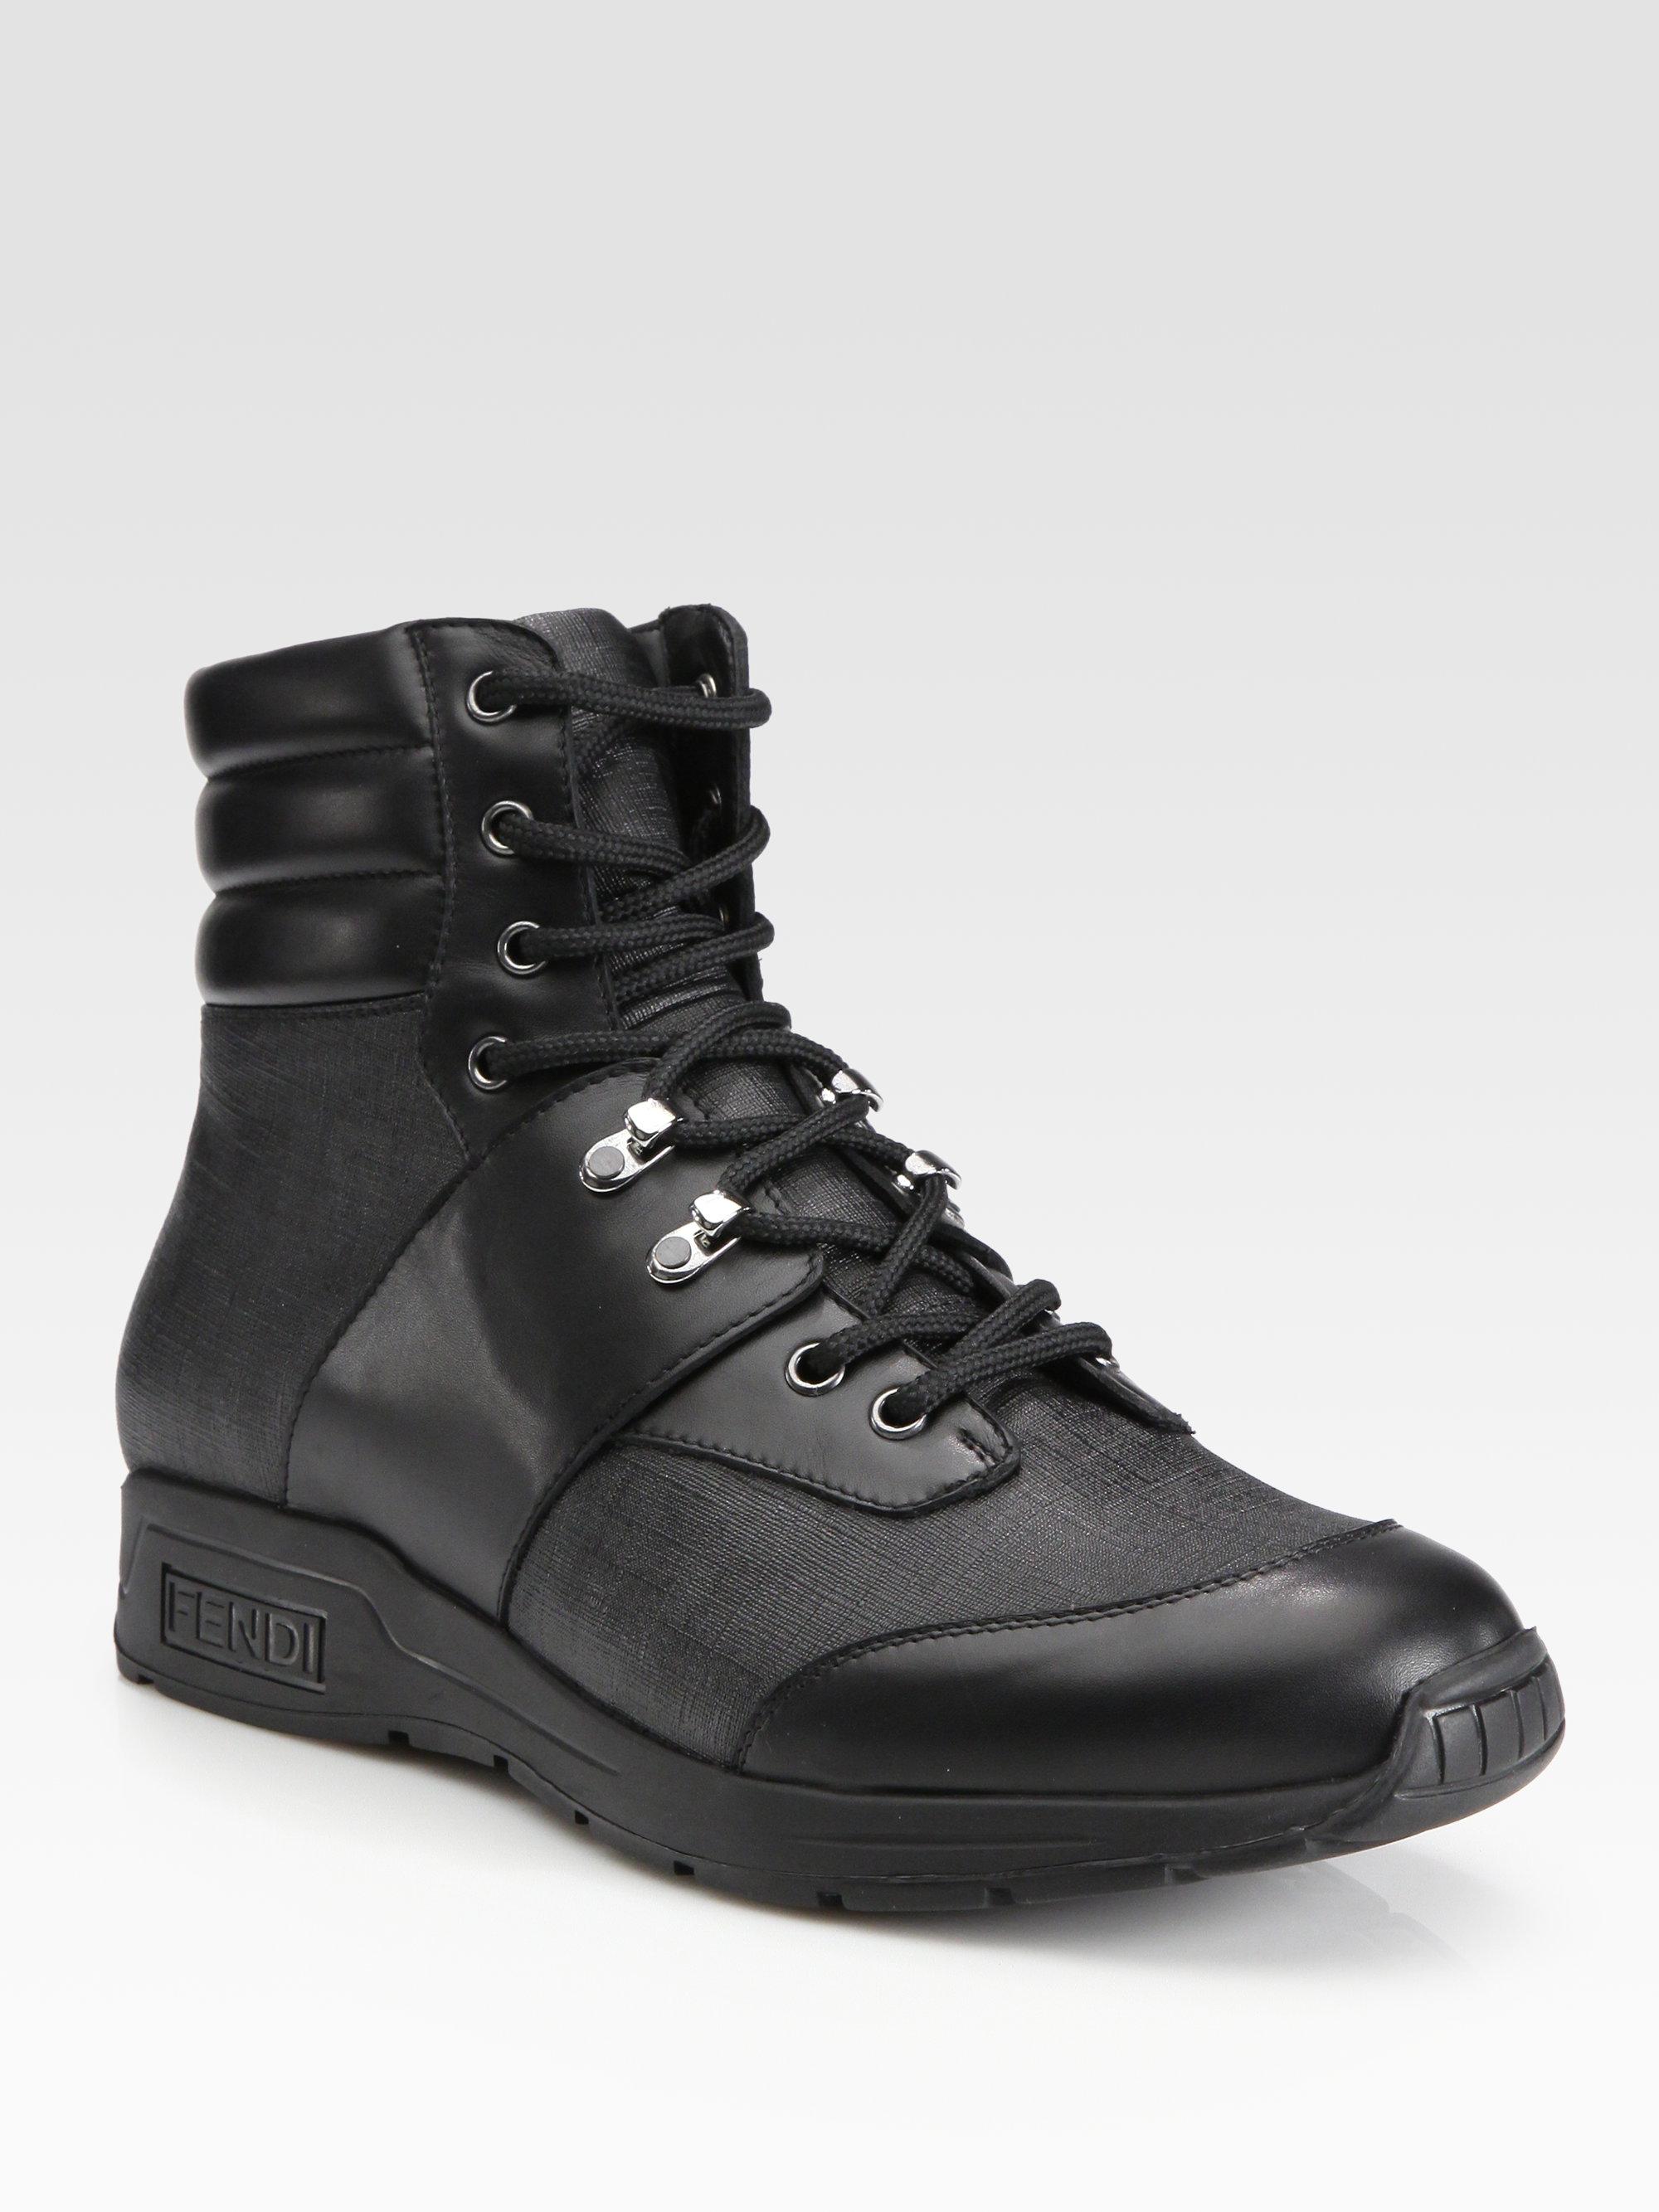 Fendi Zucca Trekking Boot In Black For Men Lyst